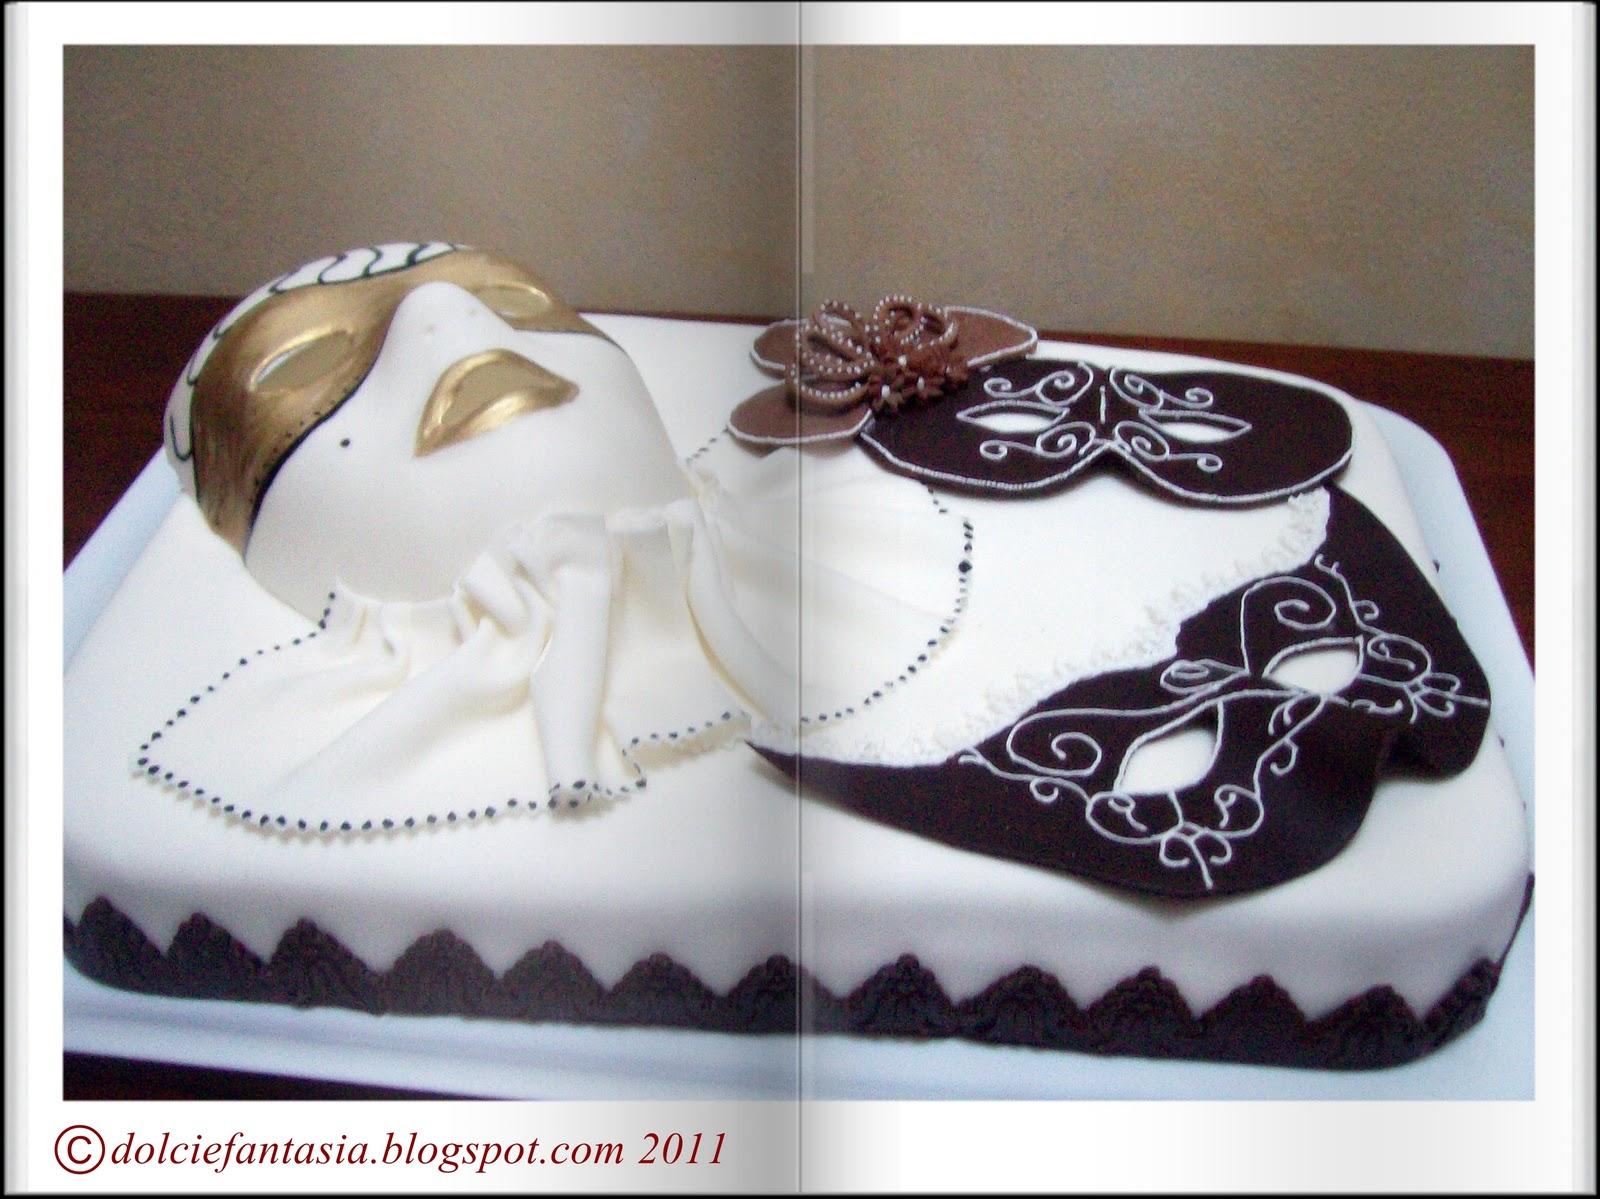 Dolci e fantasia torta di carnevale per jacopo - Decorazioni per torte di carnevale ...